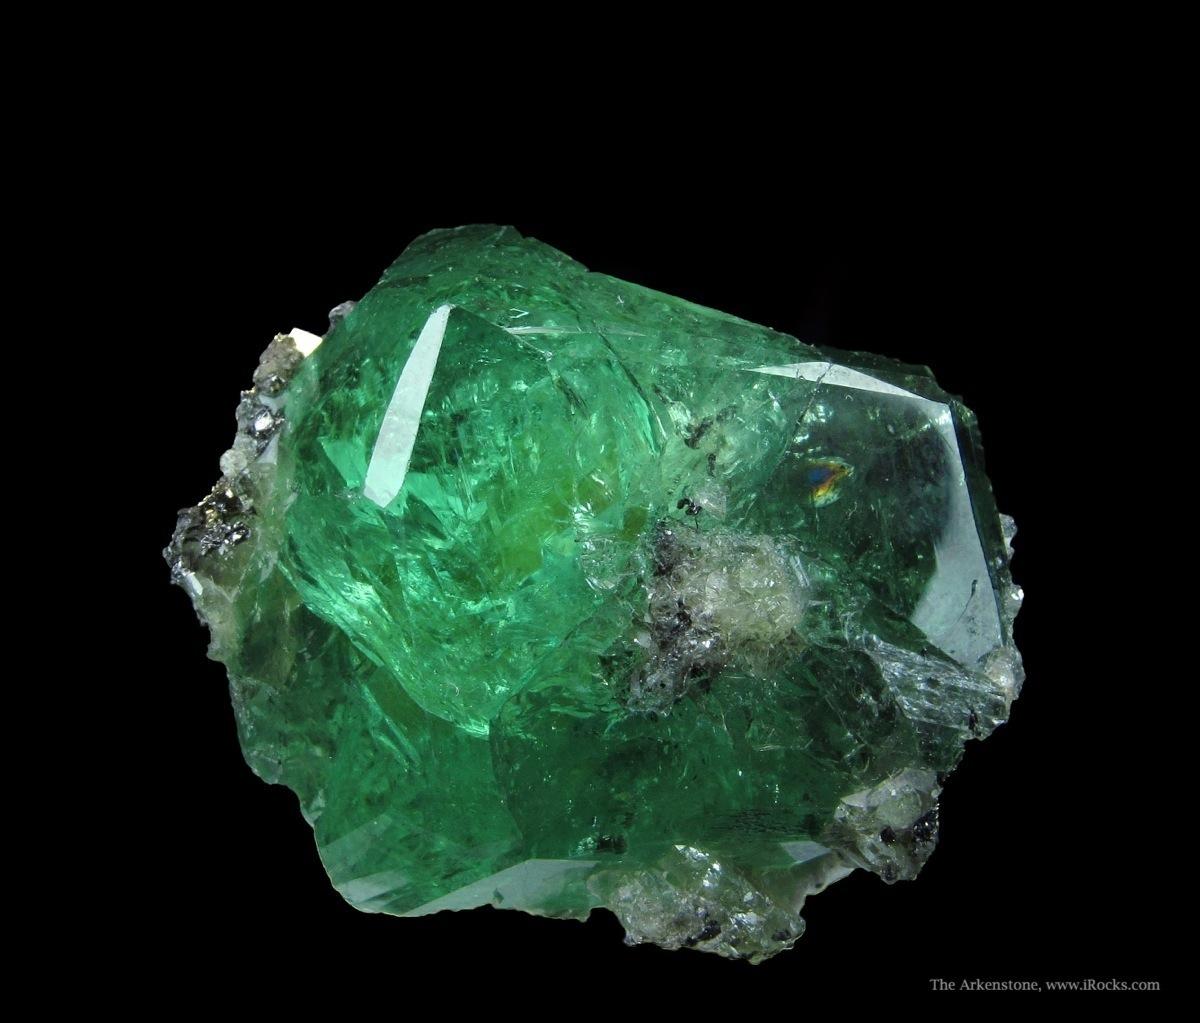 jwl14c-30a-thumbnail-toenail-miniature-fine-mineral-specimens